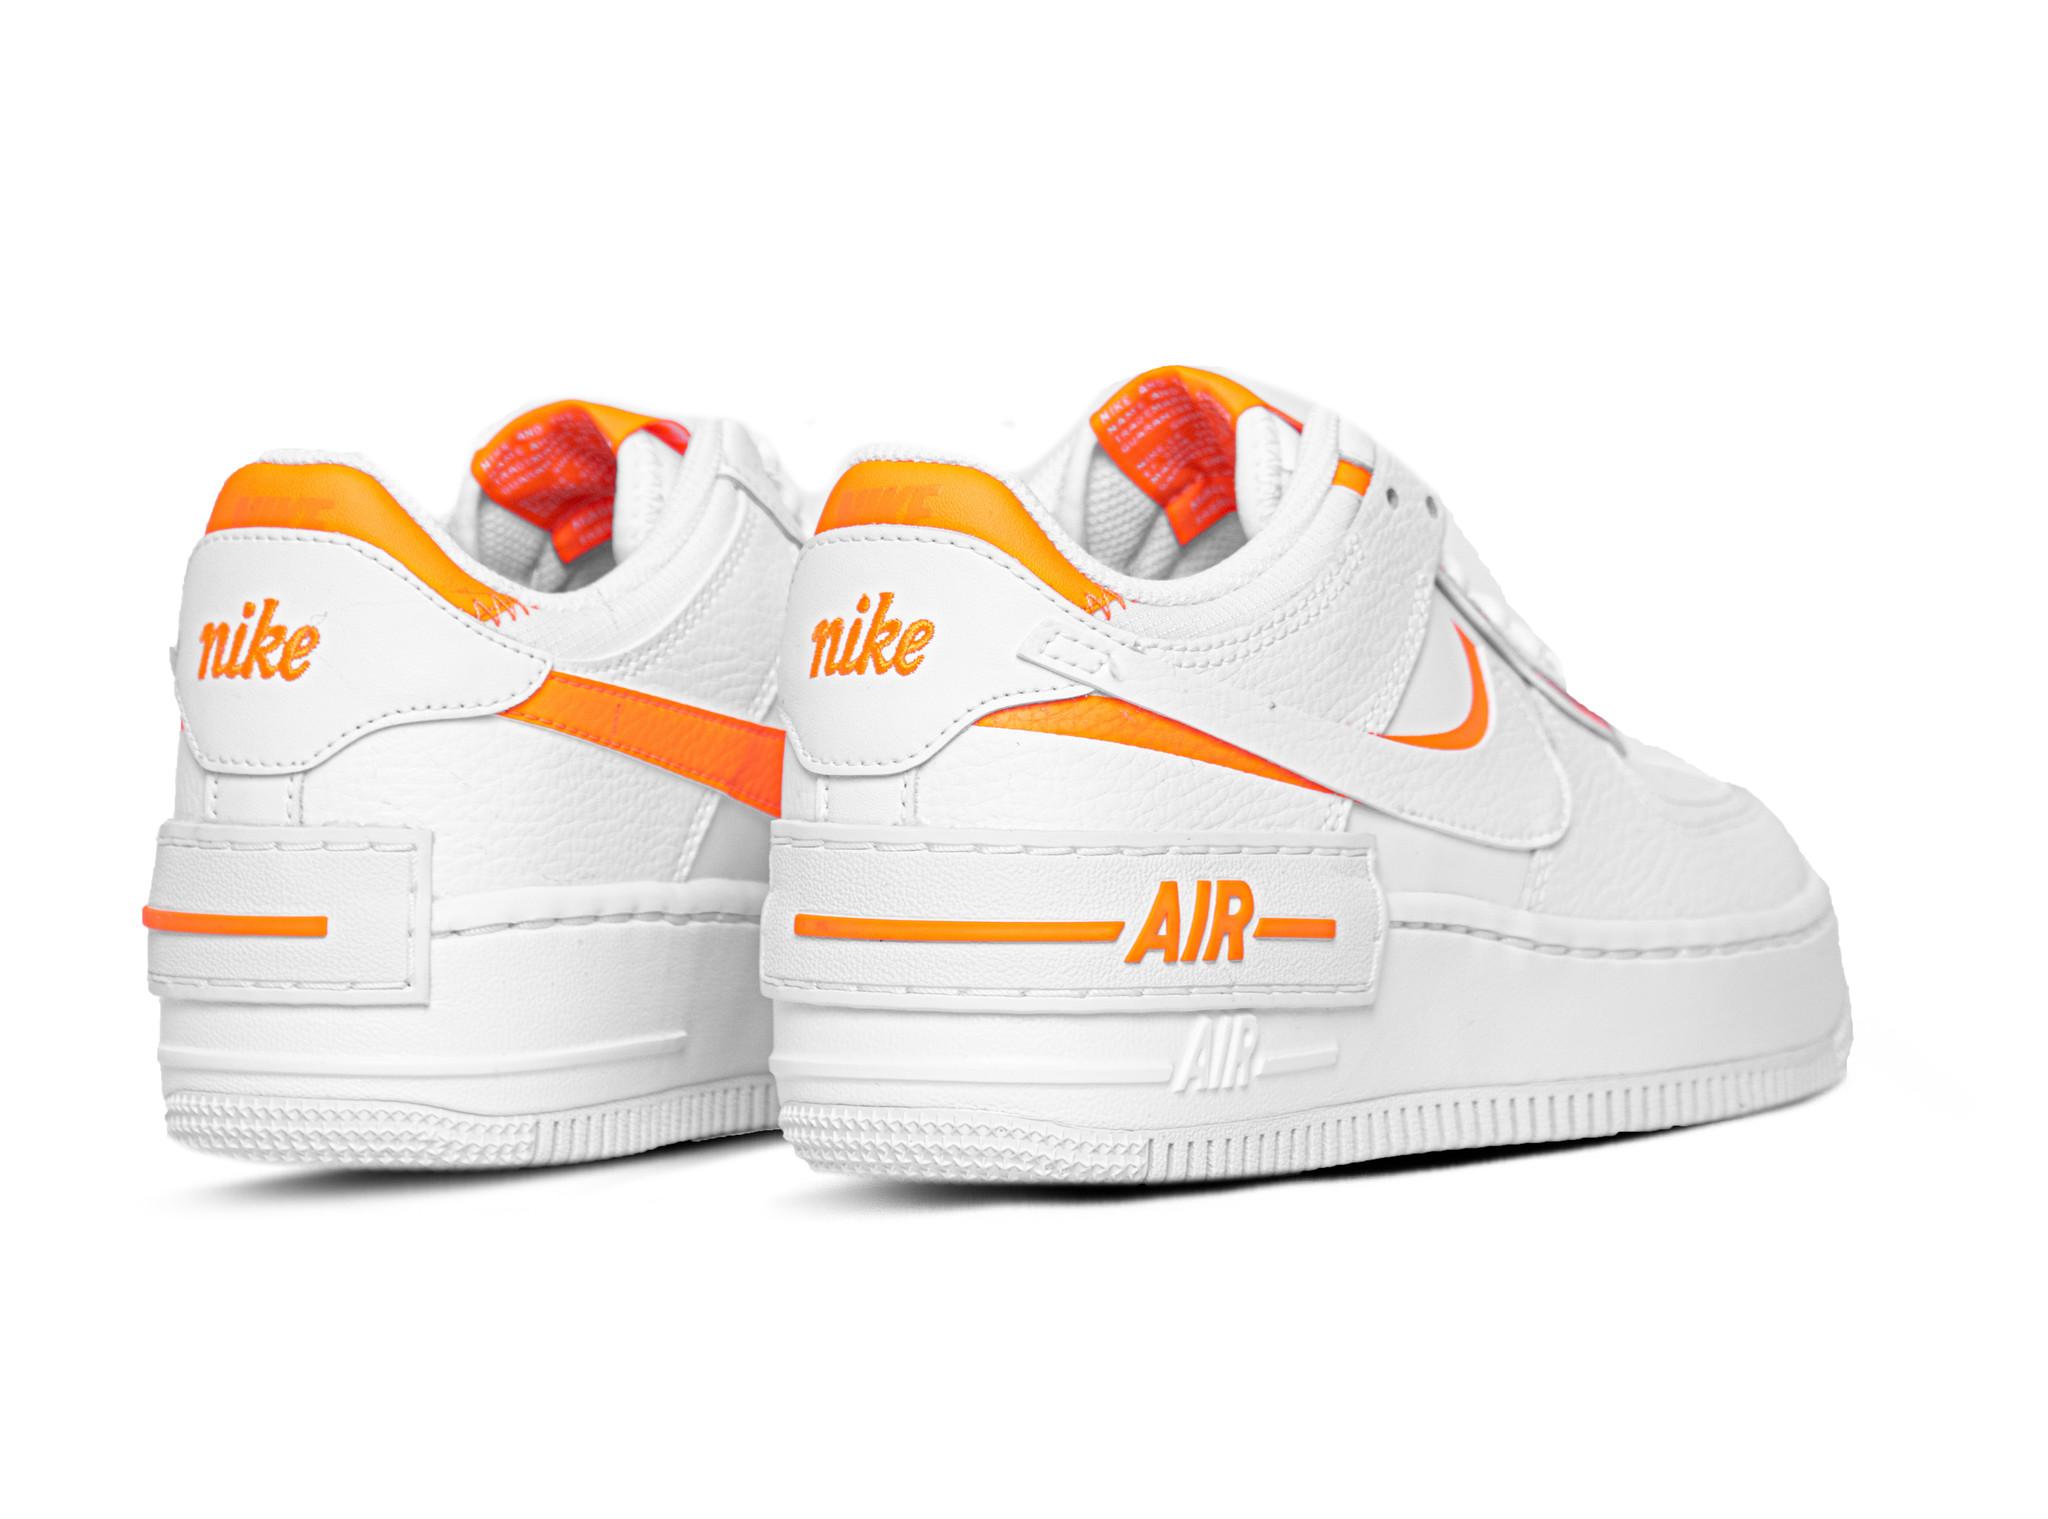 Nike Air Force 1 Shadow White Summit Whit Total Orange